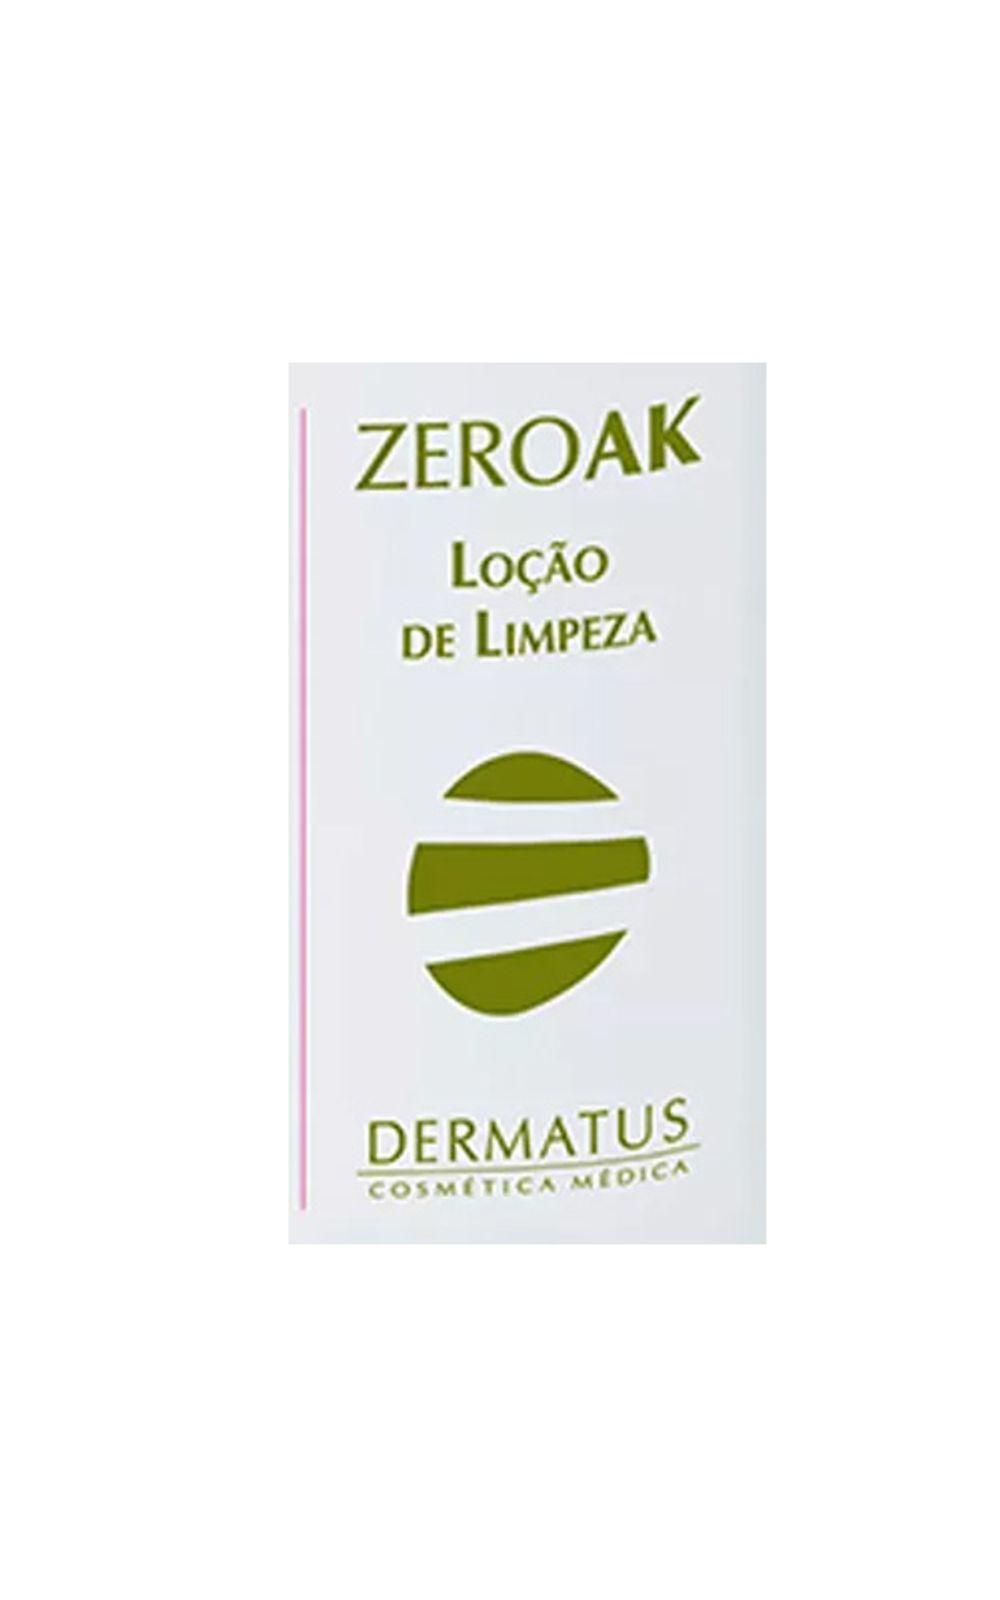 Foto 2 - ZeroAK Loção de Limpeza Dermatus - Tratamento Desobstrutor de Poros - 120ml